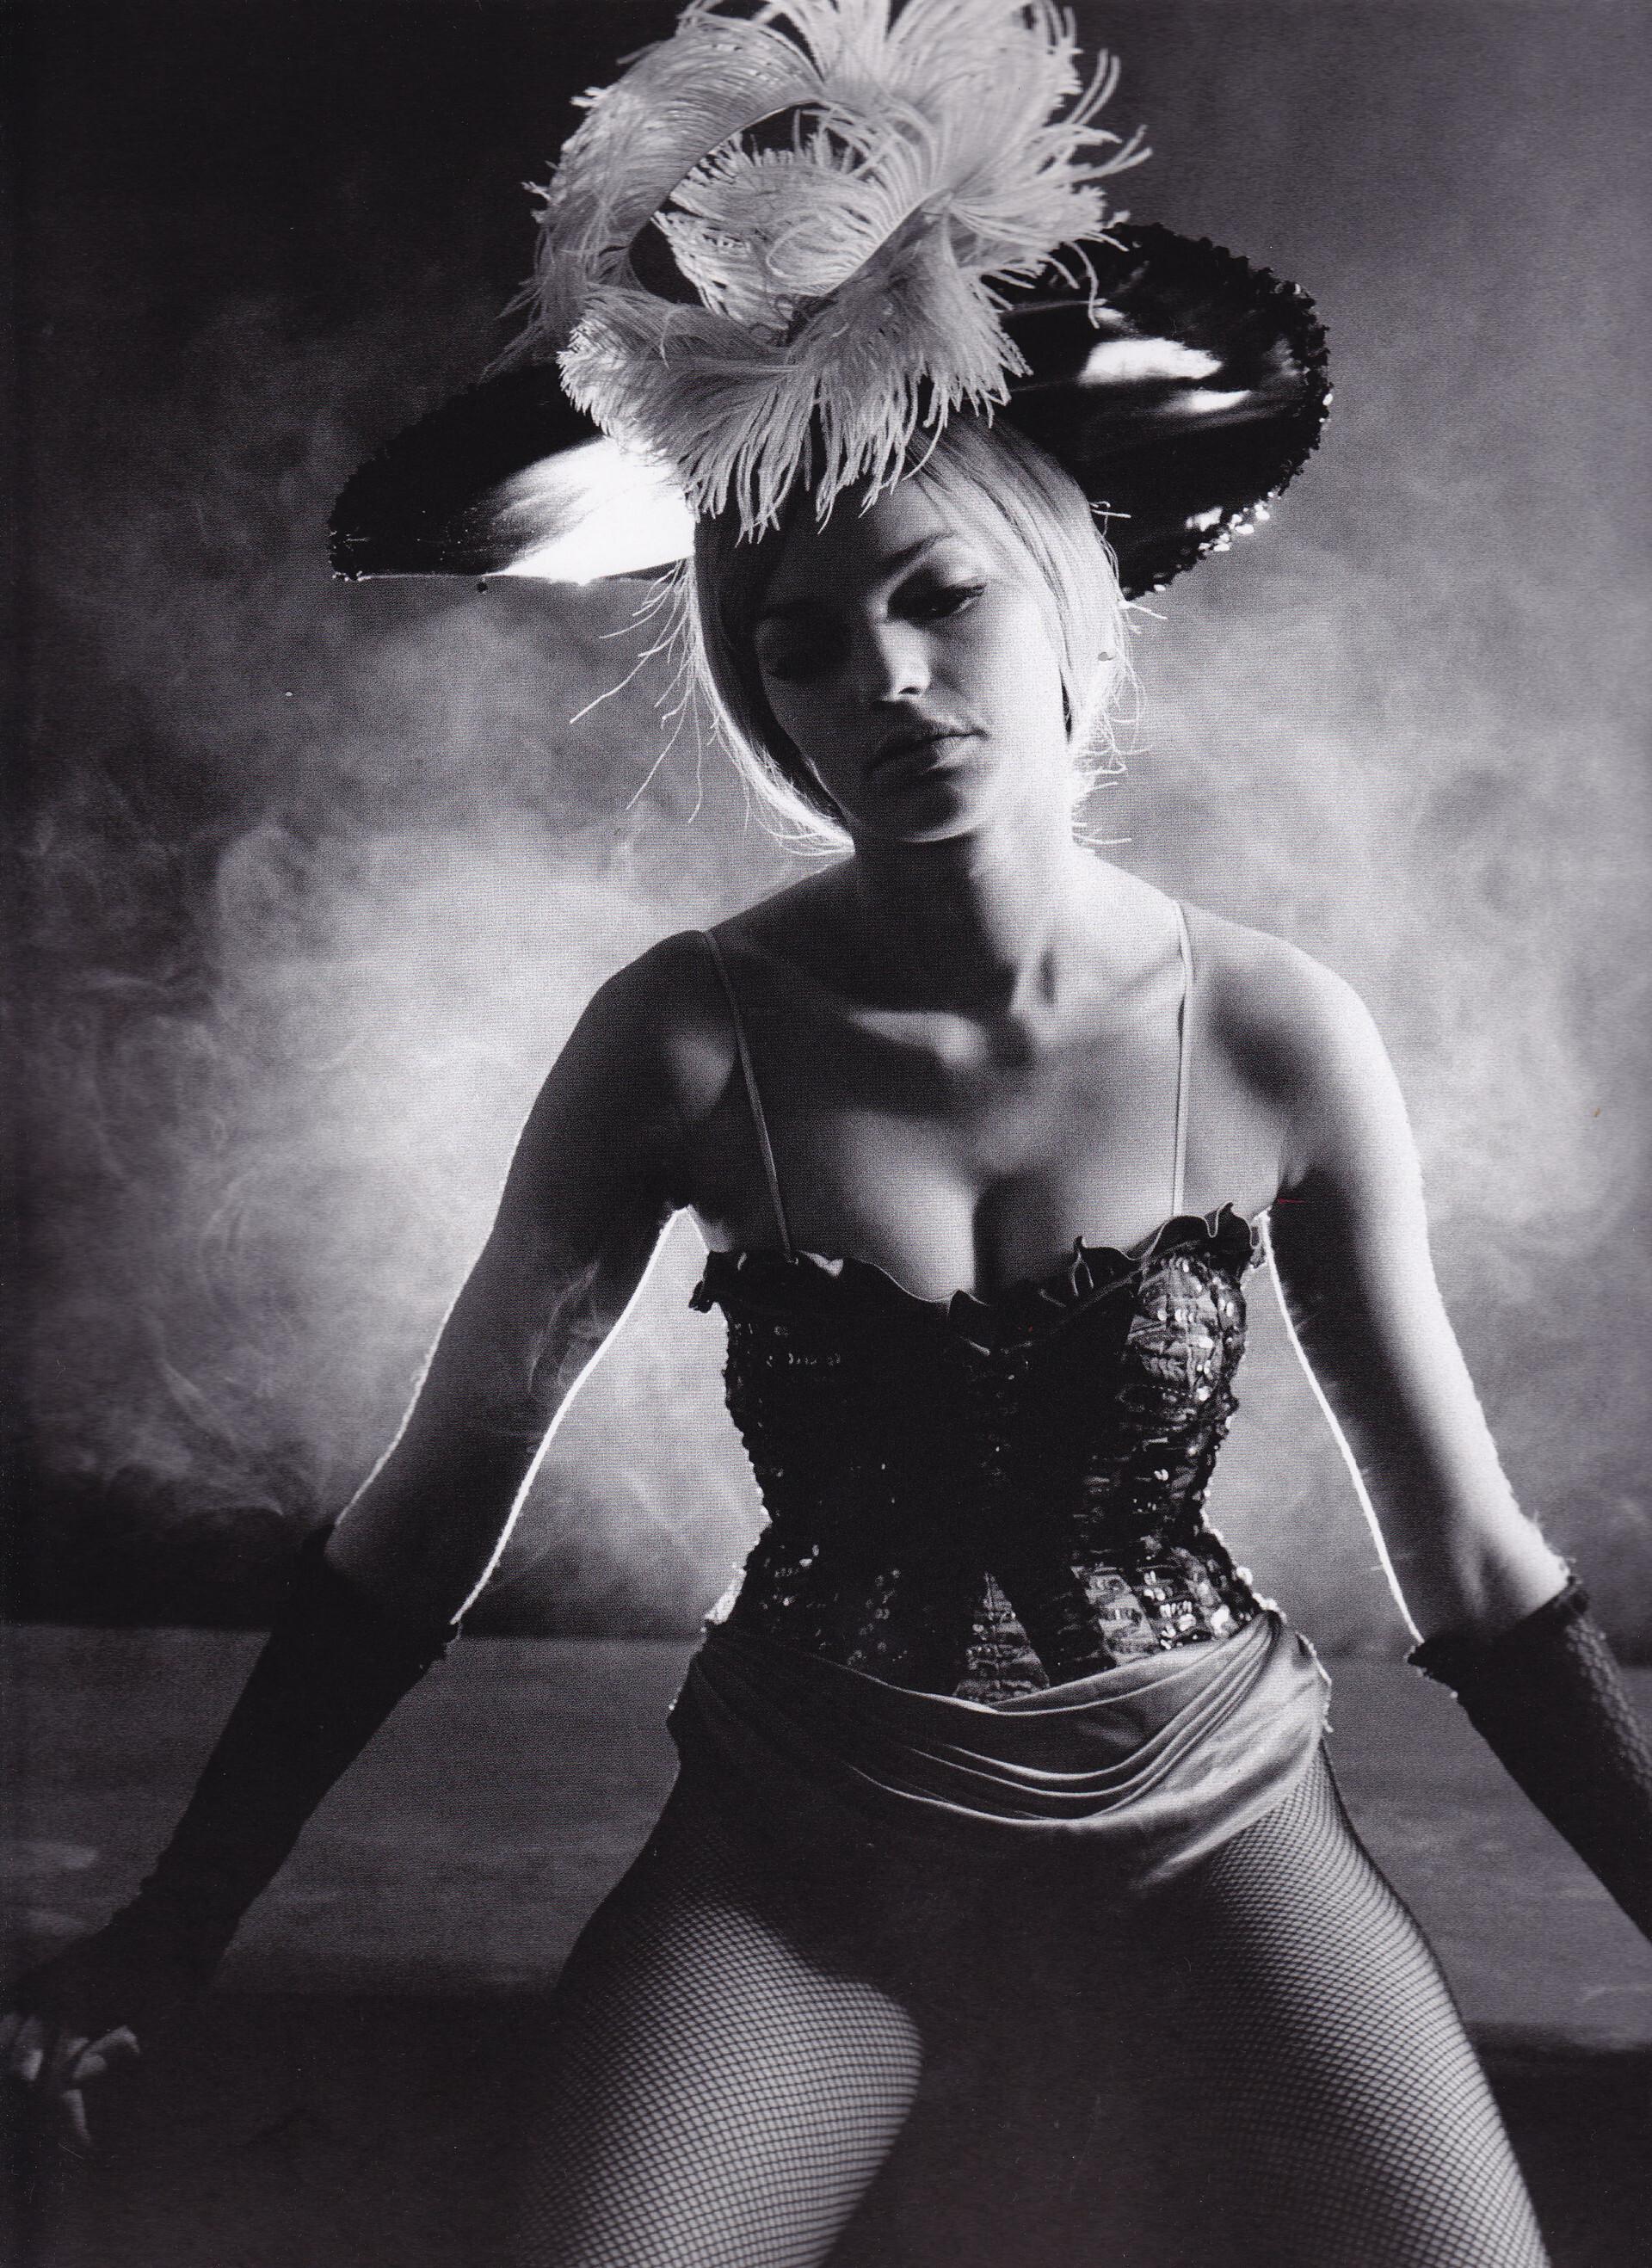 Танцовщица. Фотограф Сэм Хаскинс